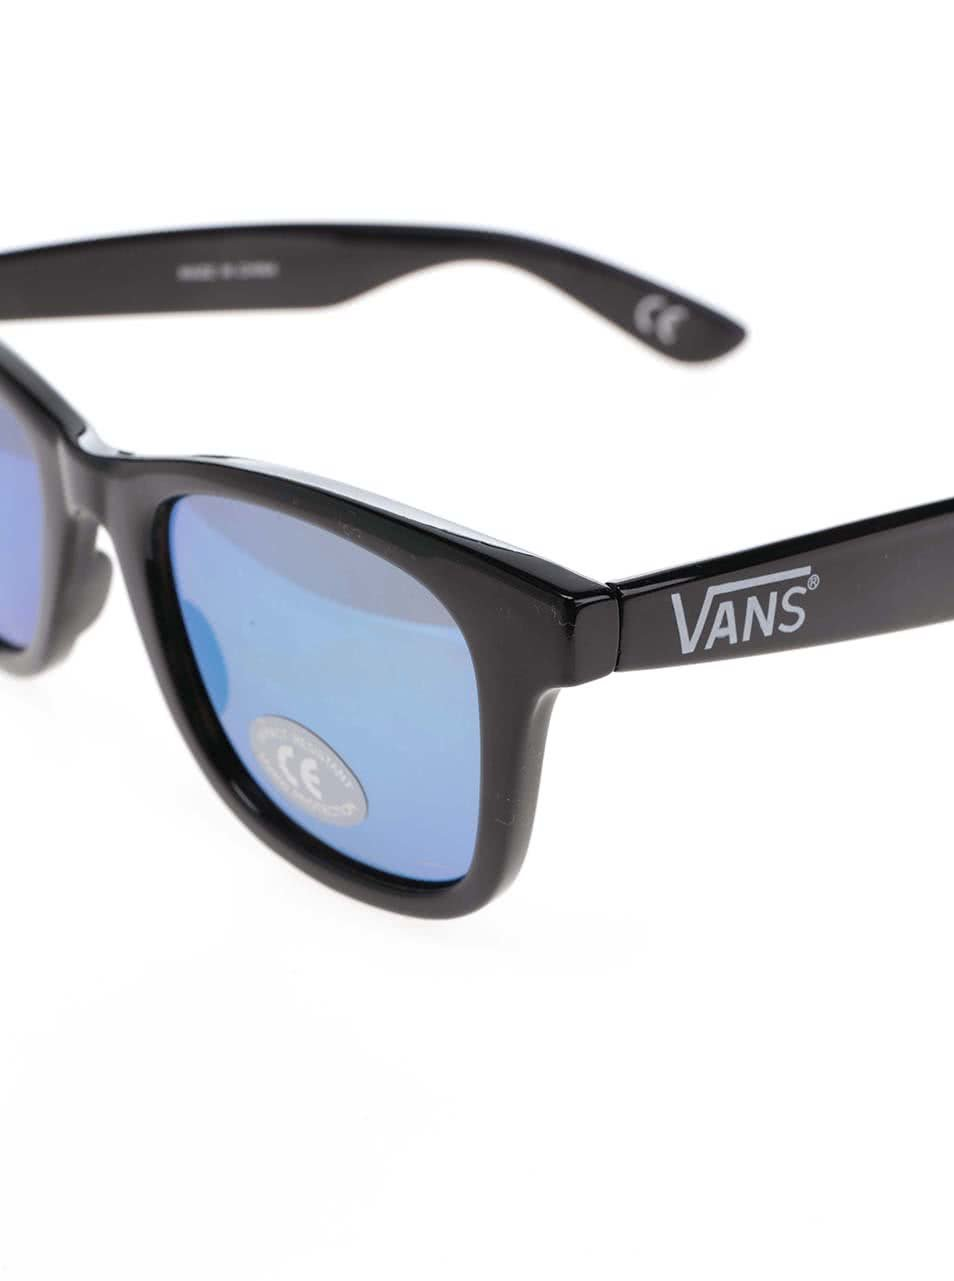 69f3641b7 Čierne dámske slnečné okuliare Vans | ZOOT.sk